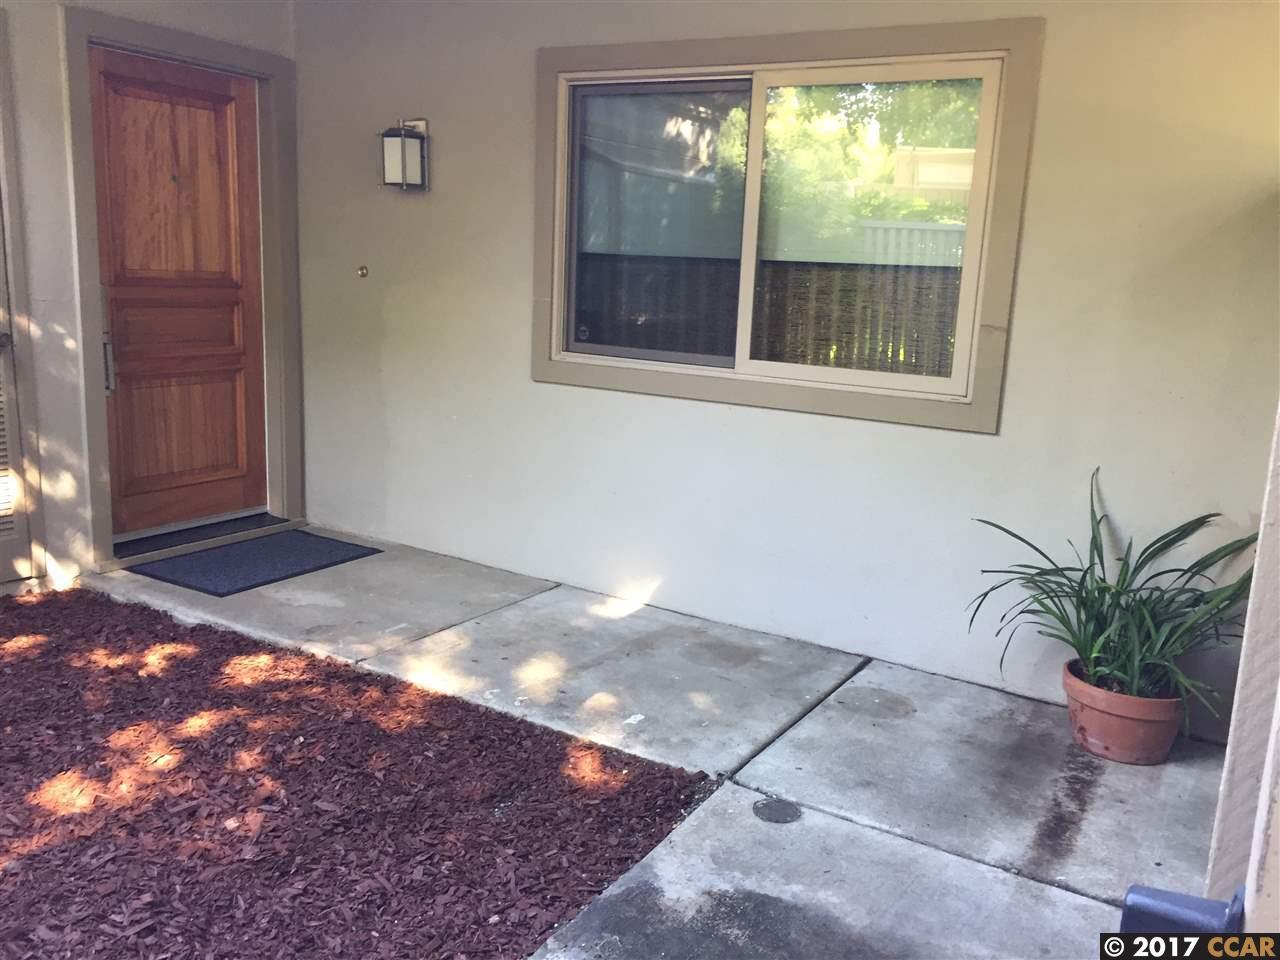 7583 Ivy Ct, Pleasanton, CA 94588 | MLS# 40779691 | Redfin